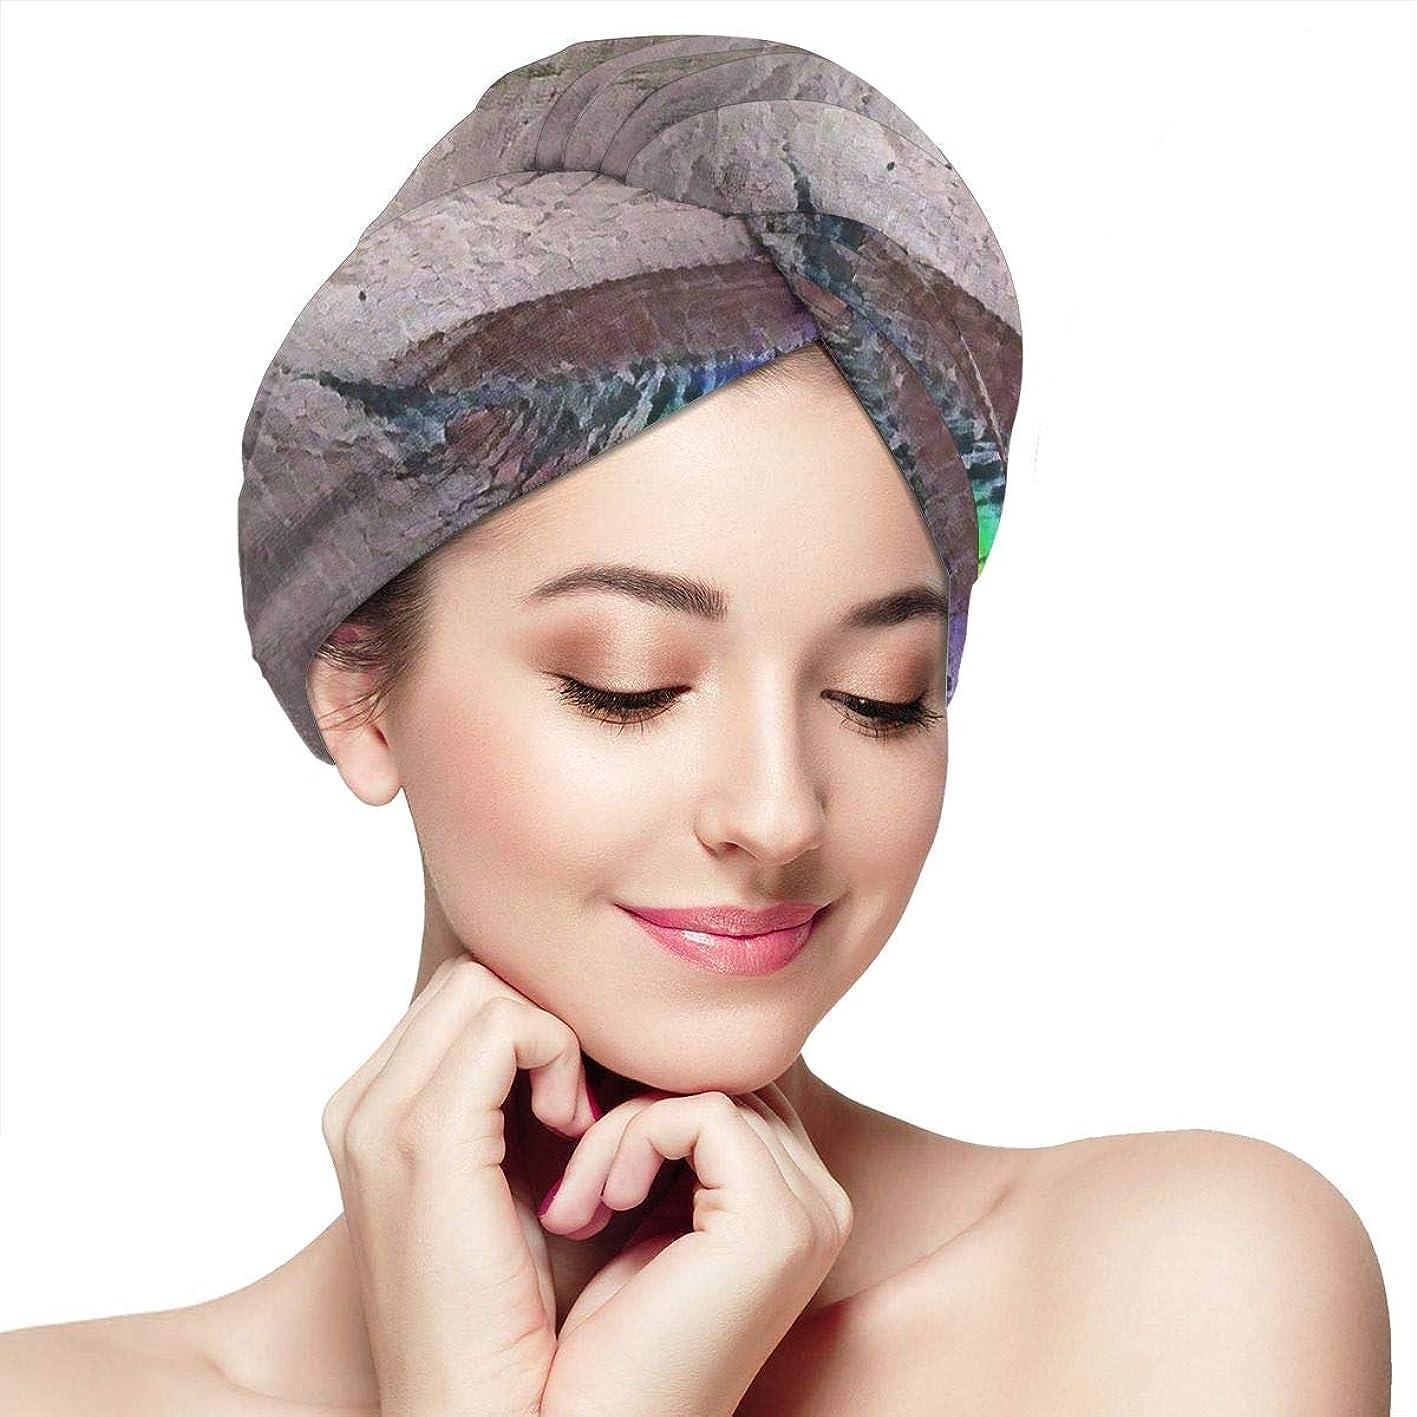 Girl's Eyes Rainbow LGBT Microfiber Hair Towel Wrap With Button Quick Dry Hair Turban For Women Girls uvzruisfbqf928